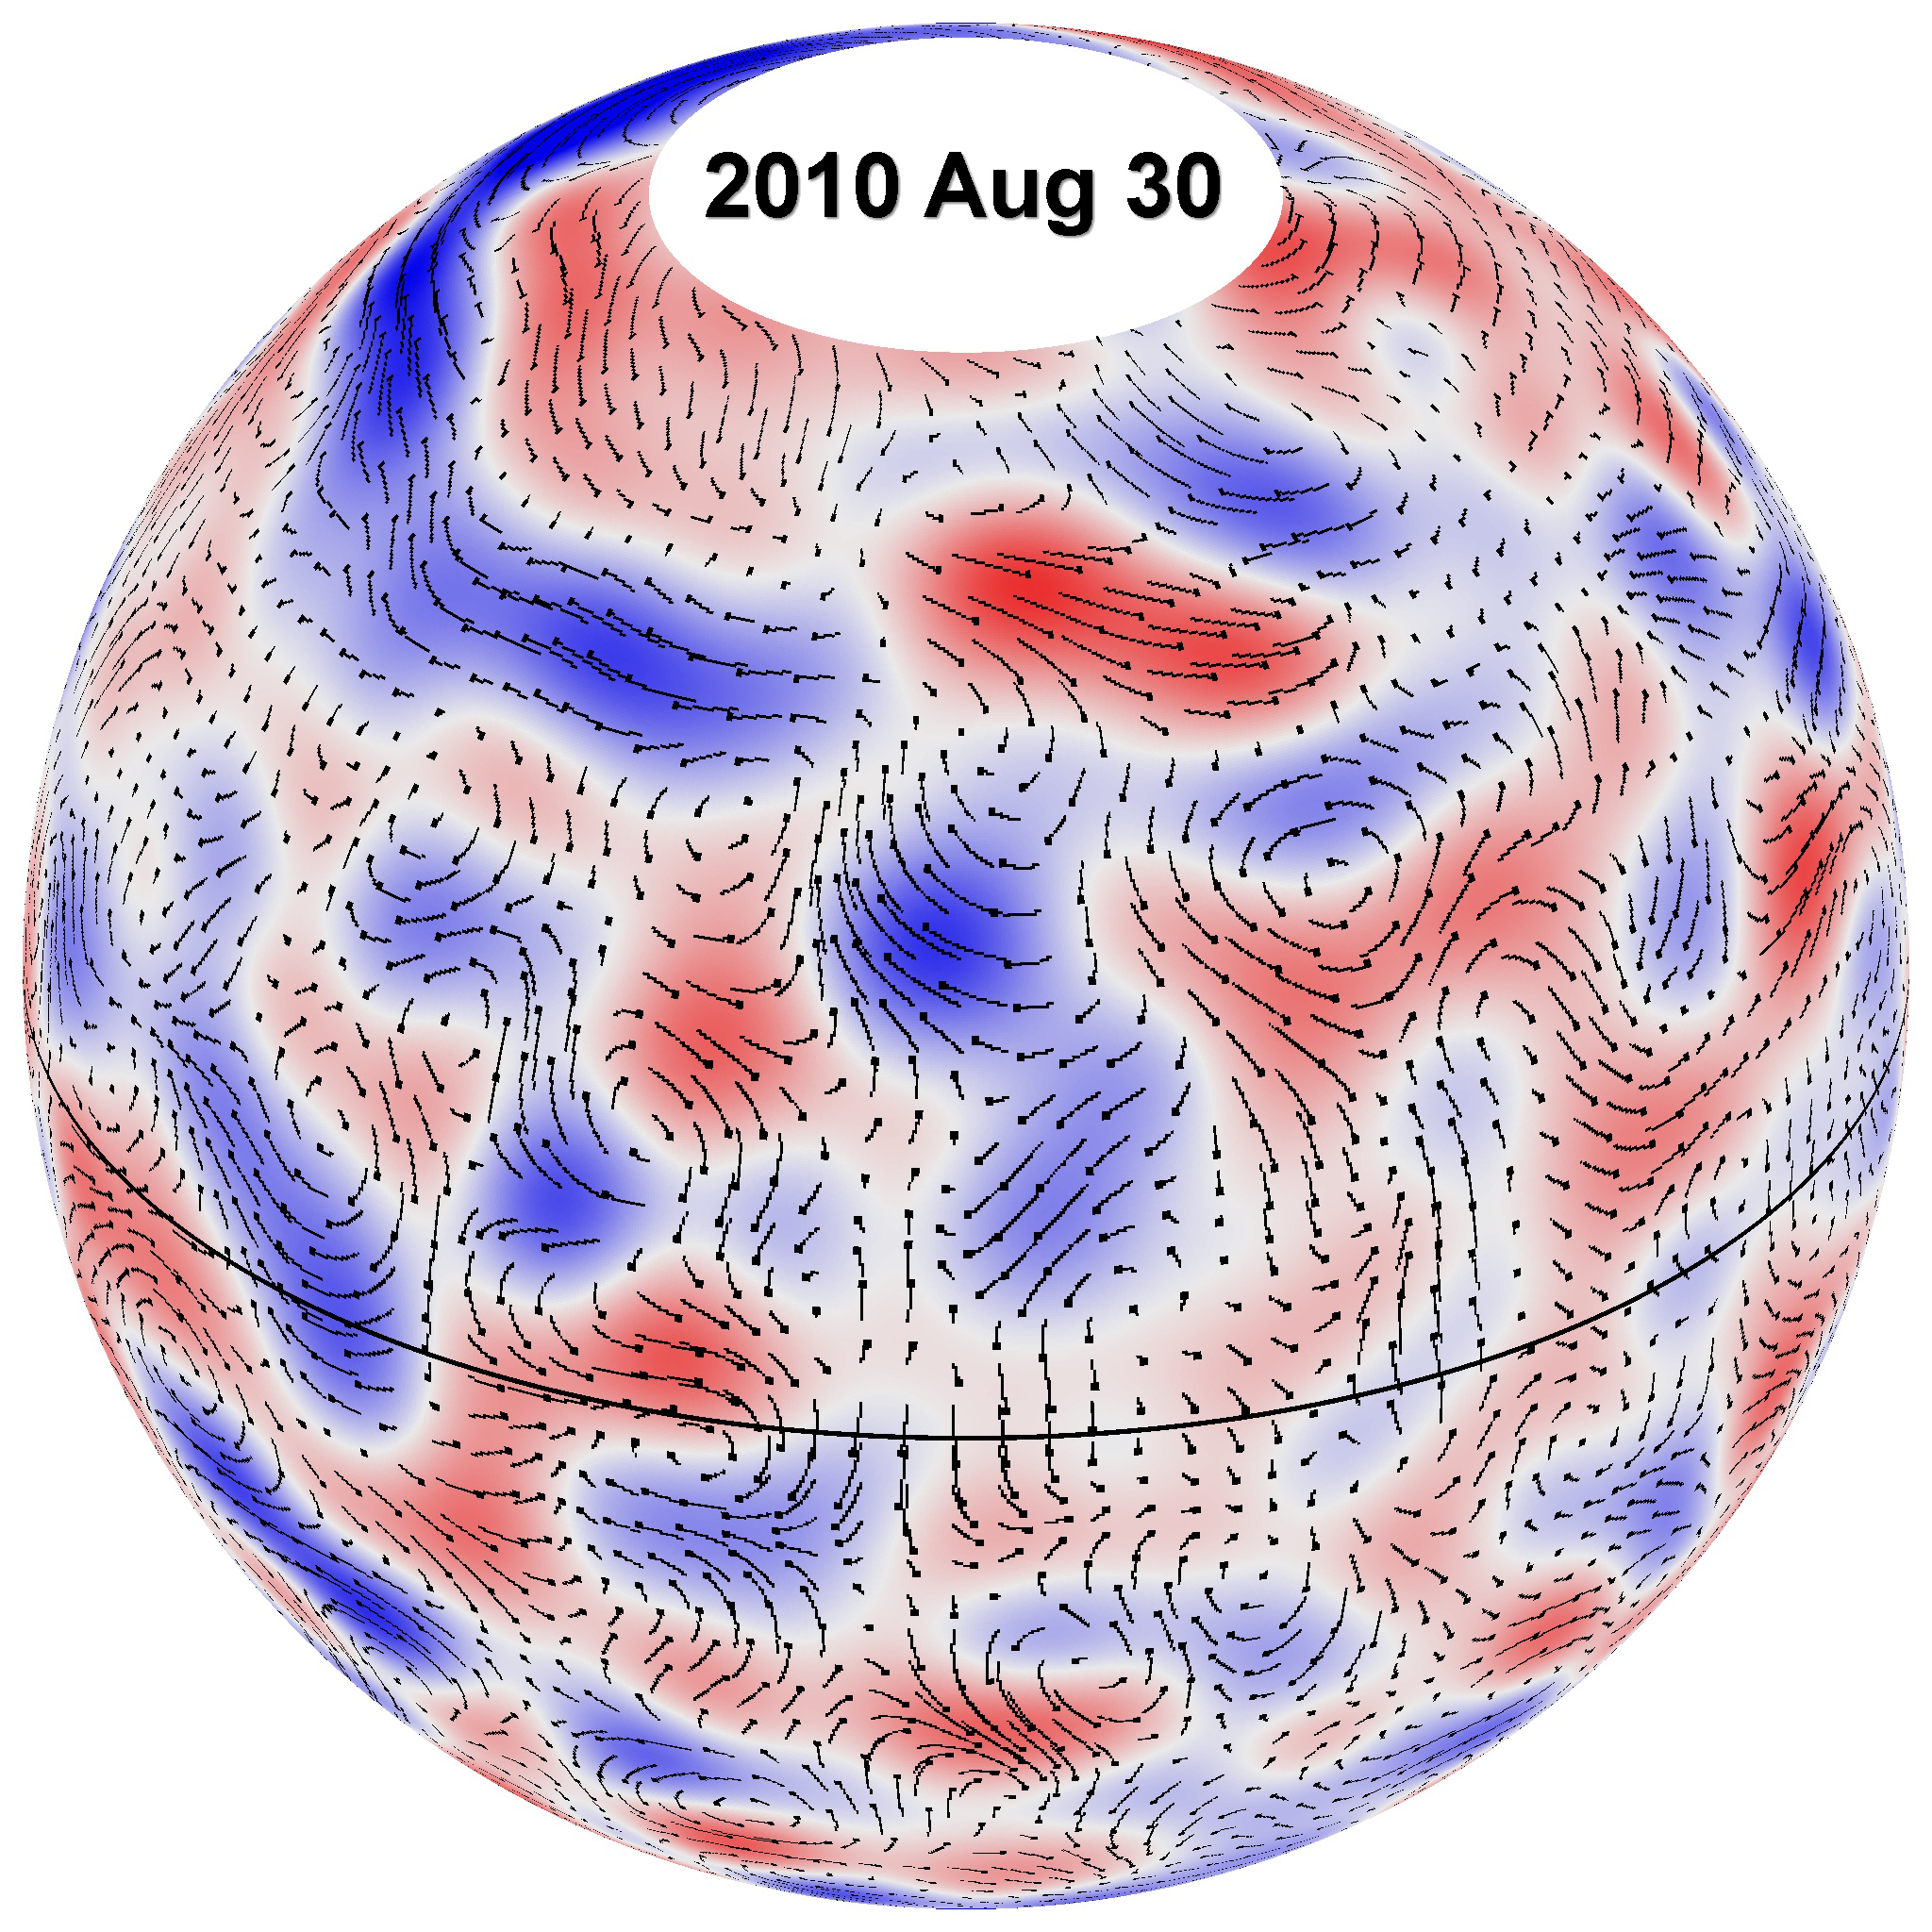 Solar astronomy help? Radiation & Convection?